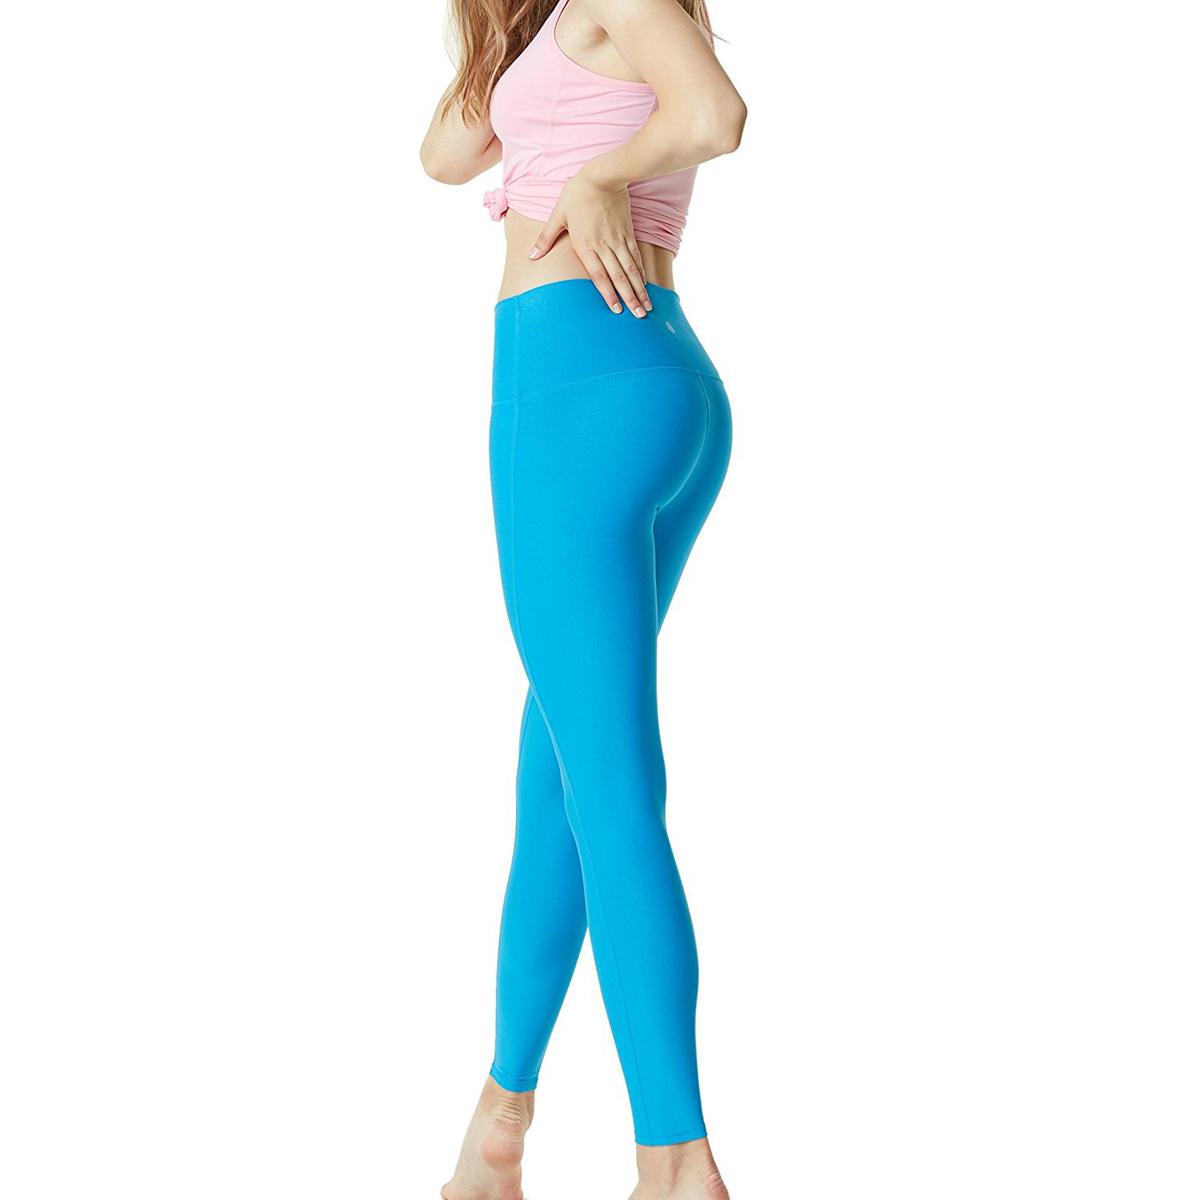 thumbnail 69 - TSLA Tesla FYP42 Women's High-Waisted Ultra-Stretch Tummy Control Yoga Pants